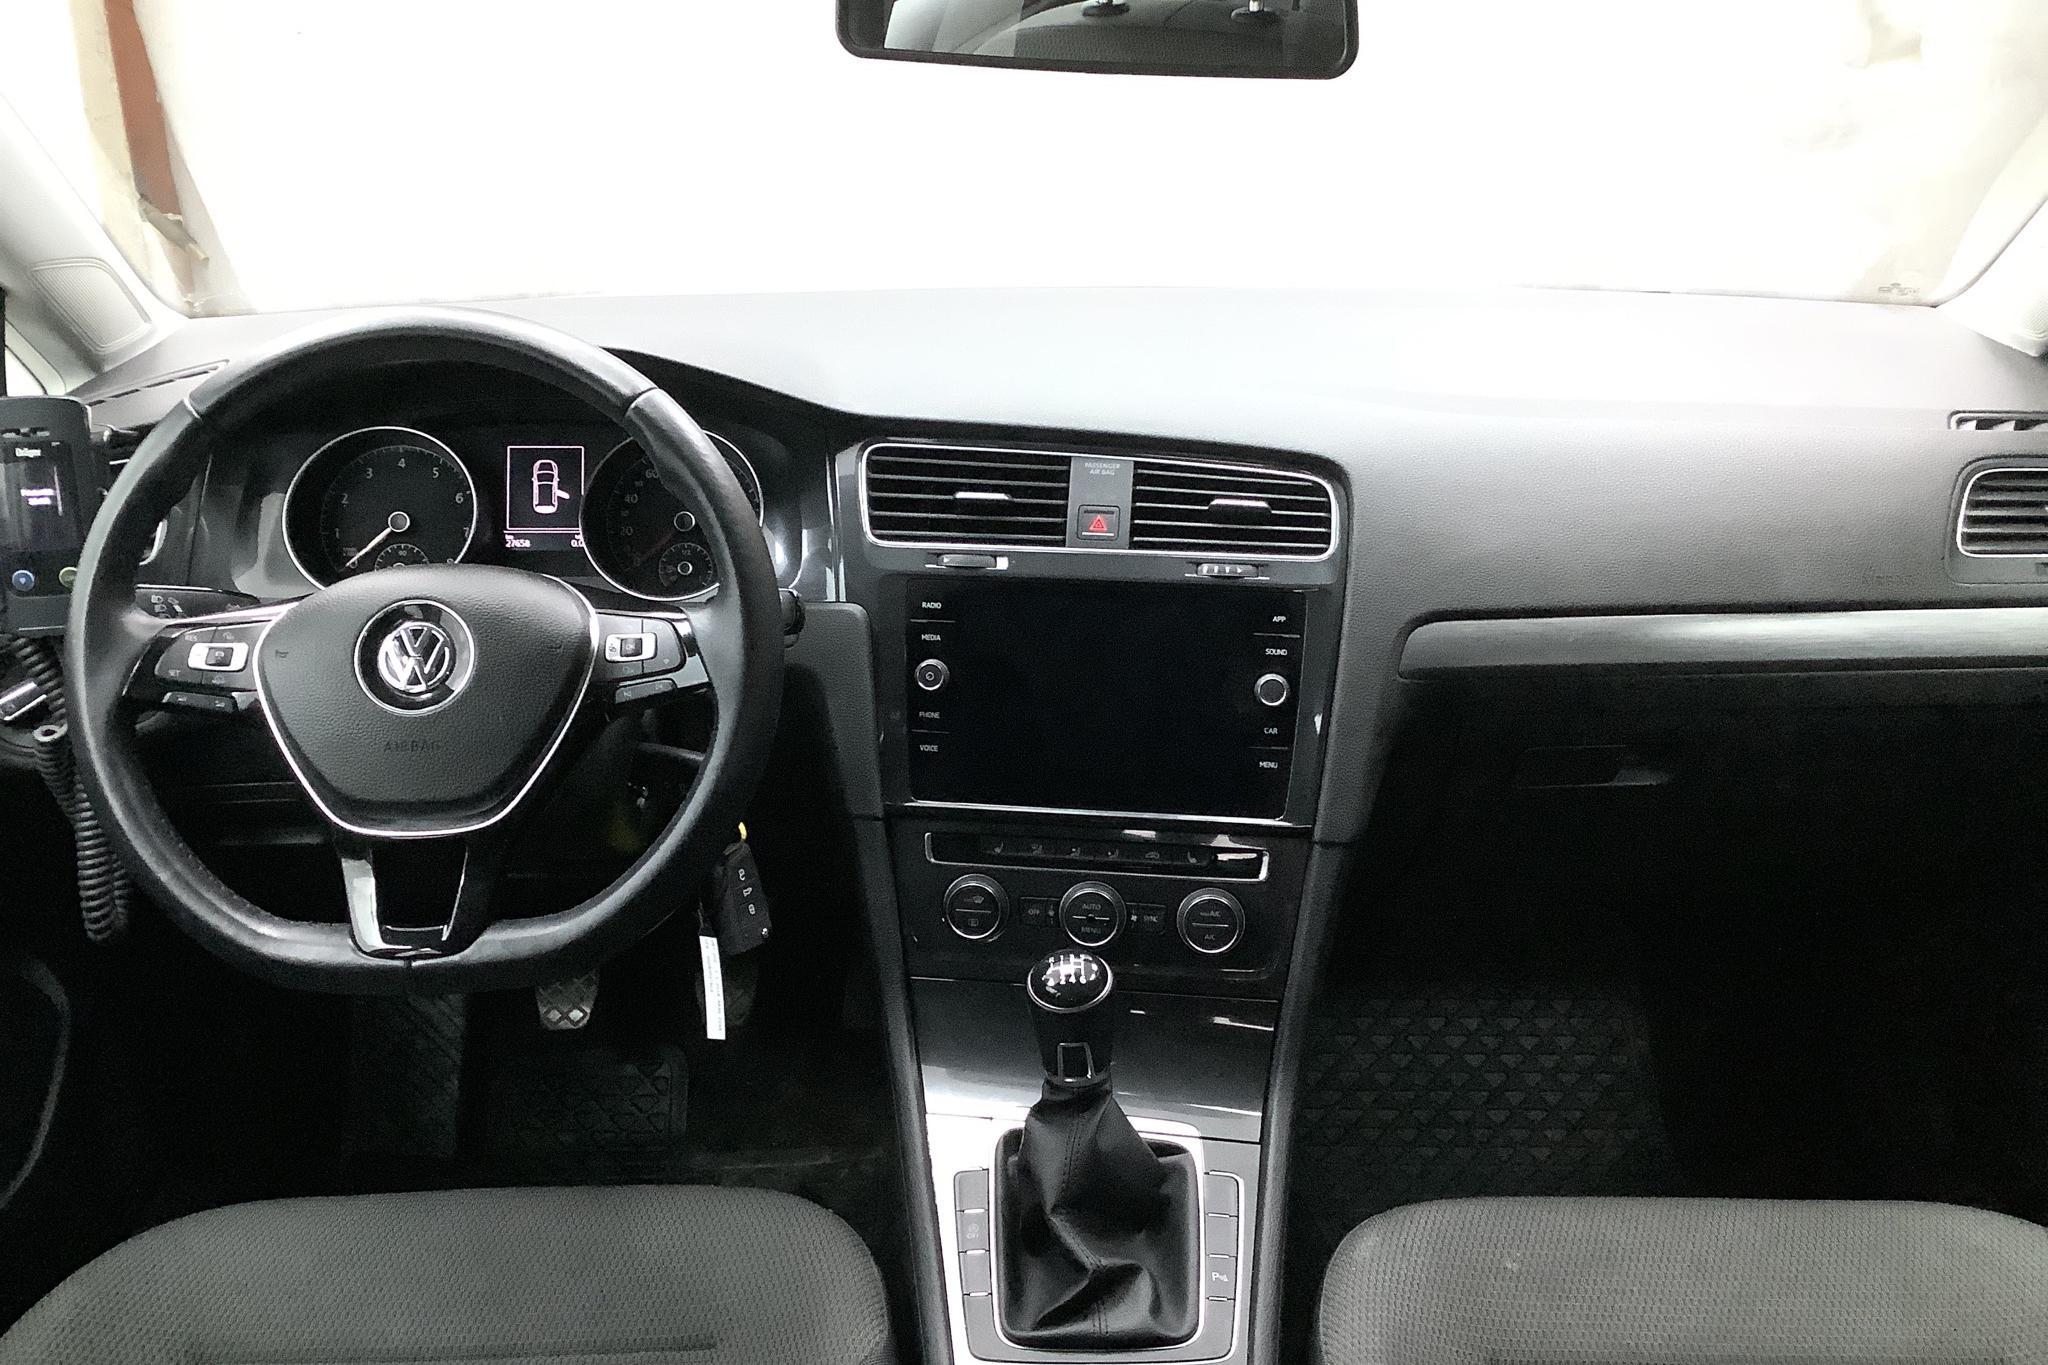 VW Golf VII 1.4 TSI Multifuel 5dr (125hk) - 2 766 mil - Manuell - vit - 2018